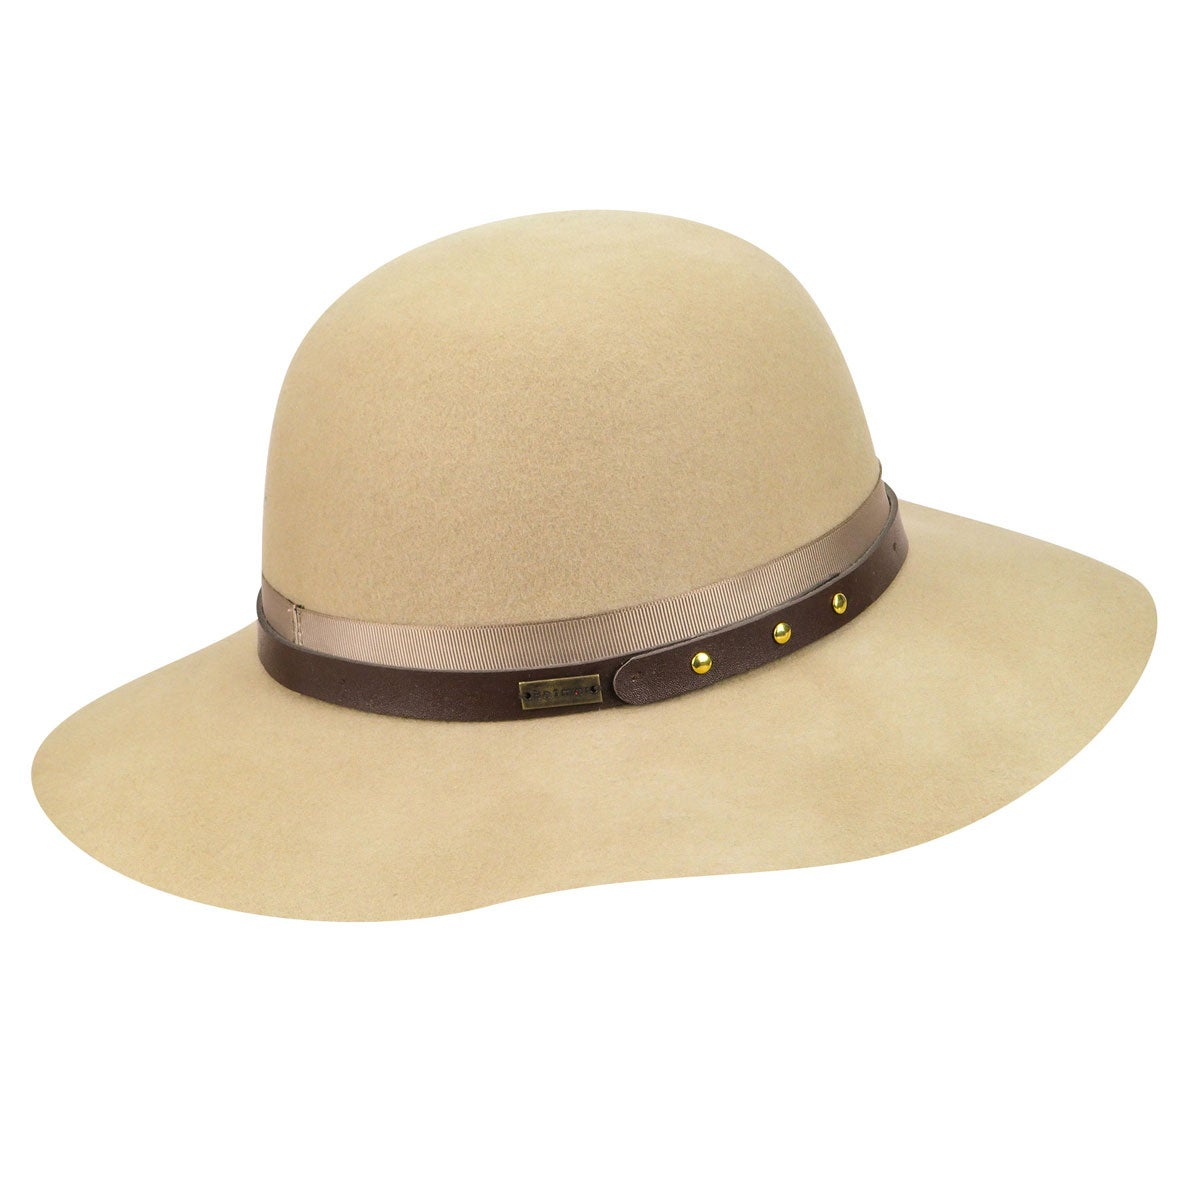 Betmar Hayden Floppy Hat in Light Camel